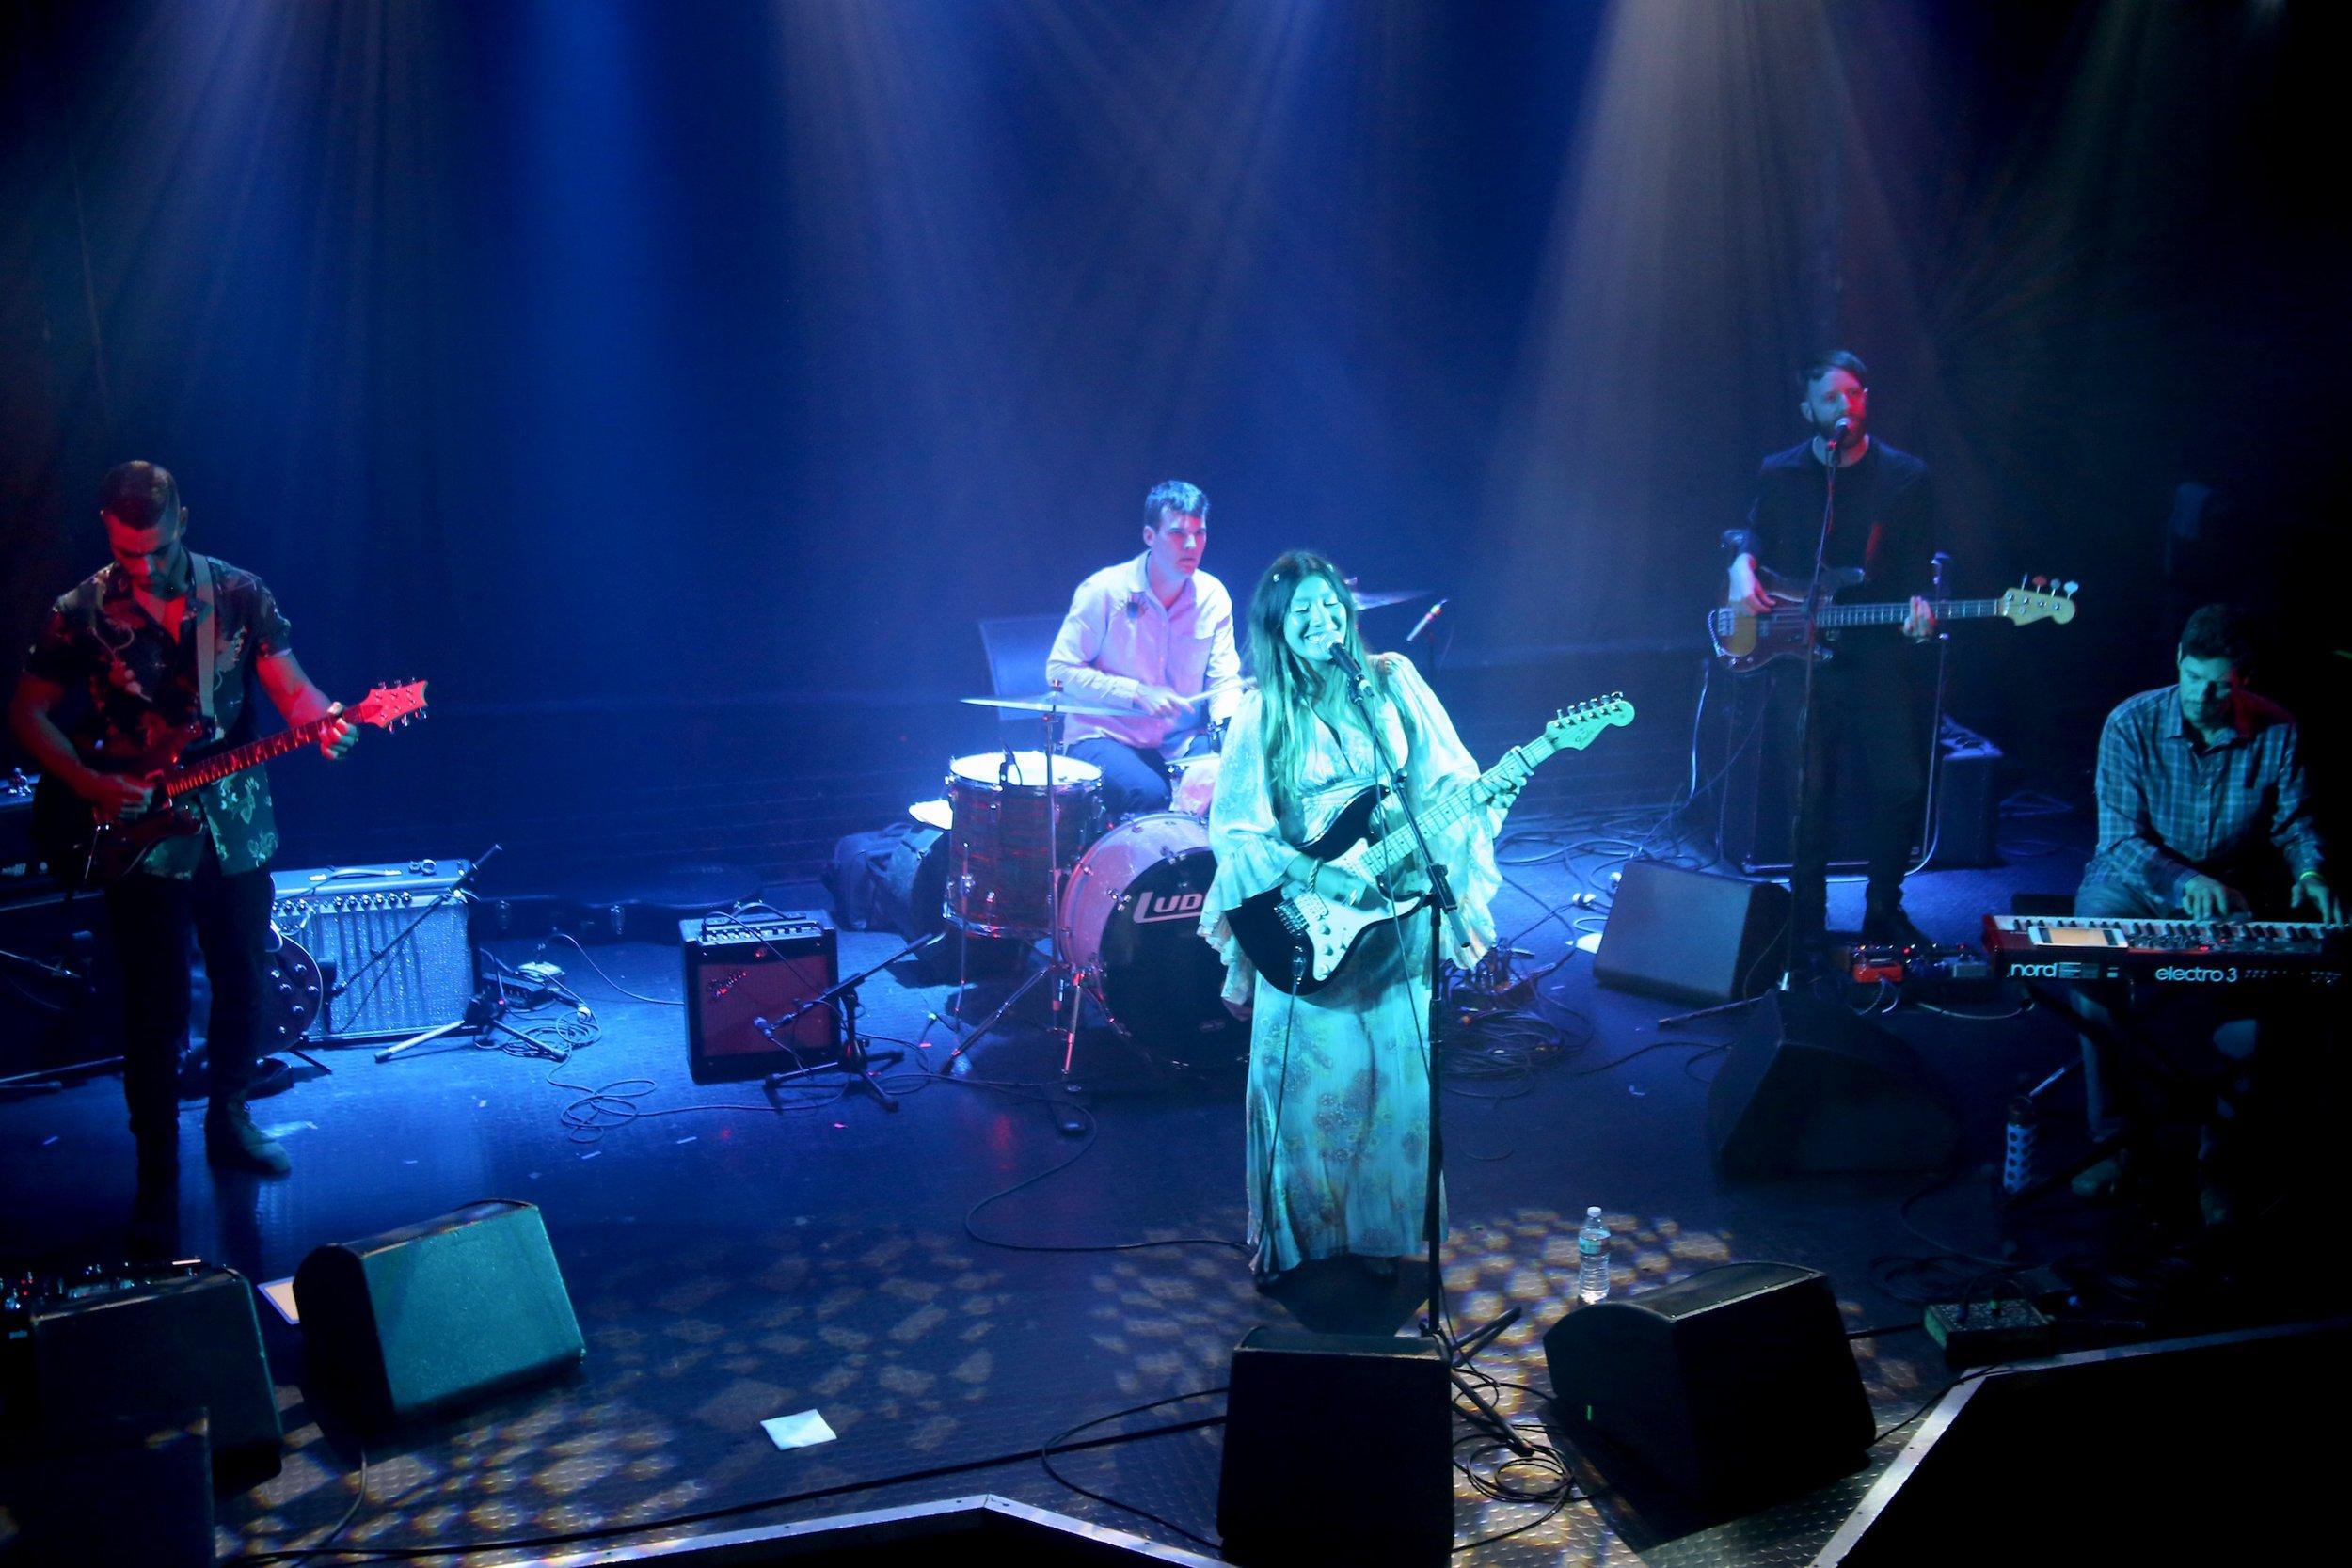 Tara Beier & Band @Troubadour, Los Angeles